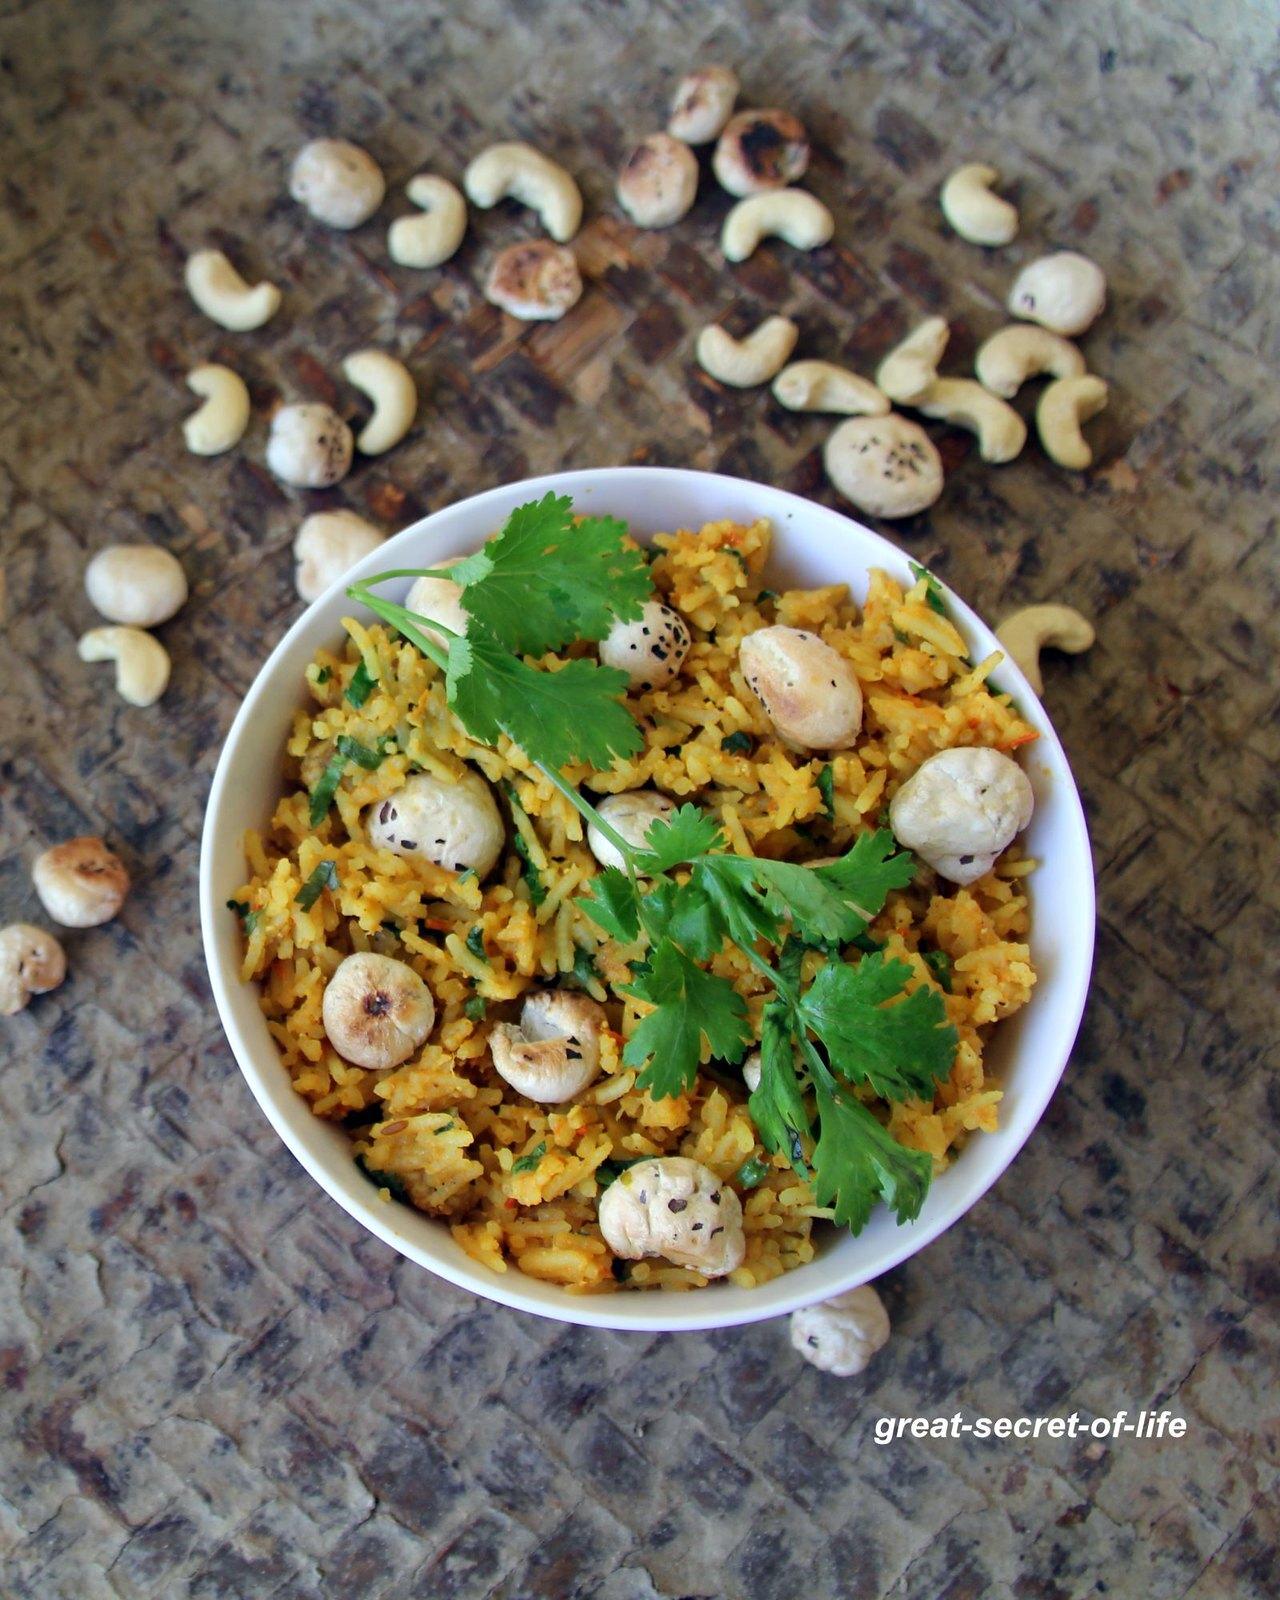 Makhana rice - Lotus seeds Rice - Pool makhana rice - Simple lunch recipes - Healthy rice recipes